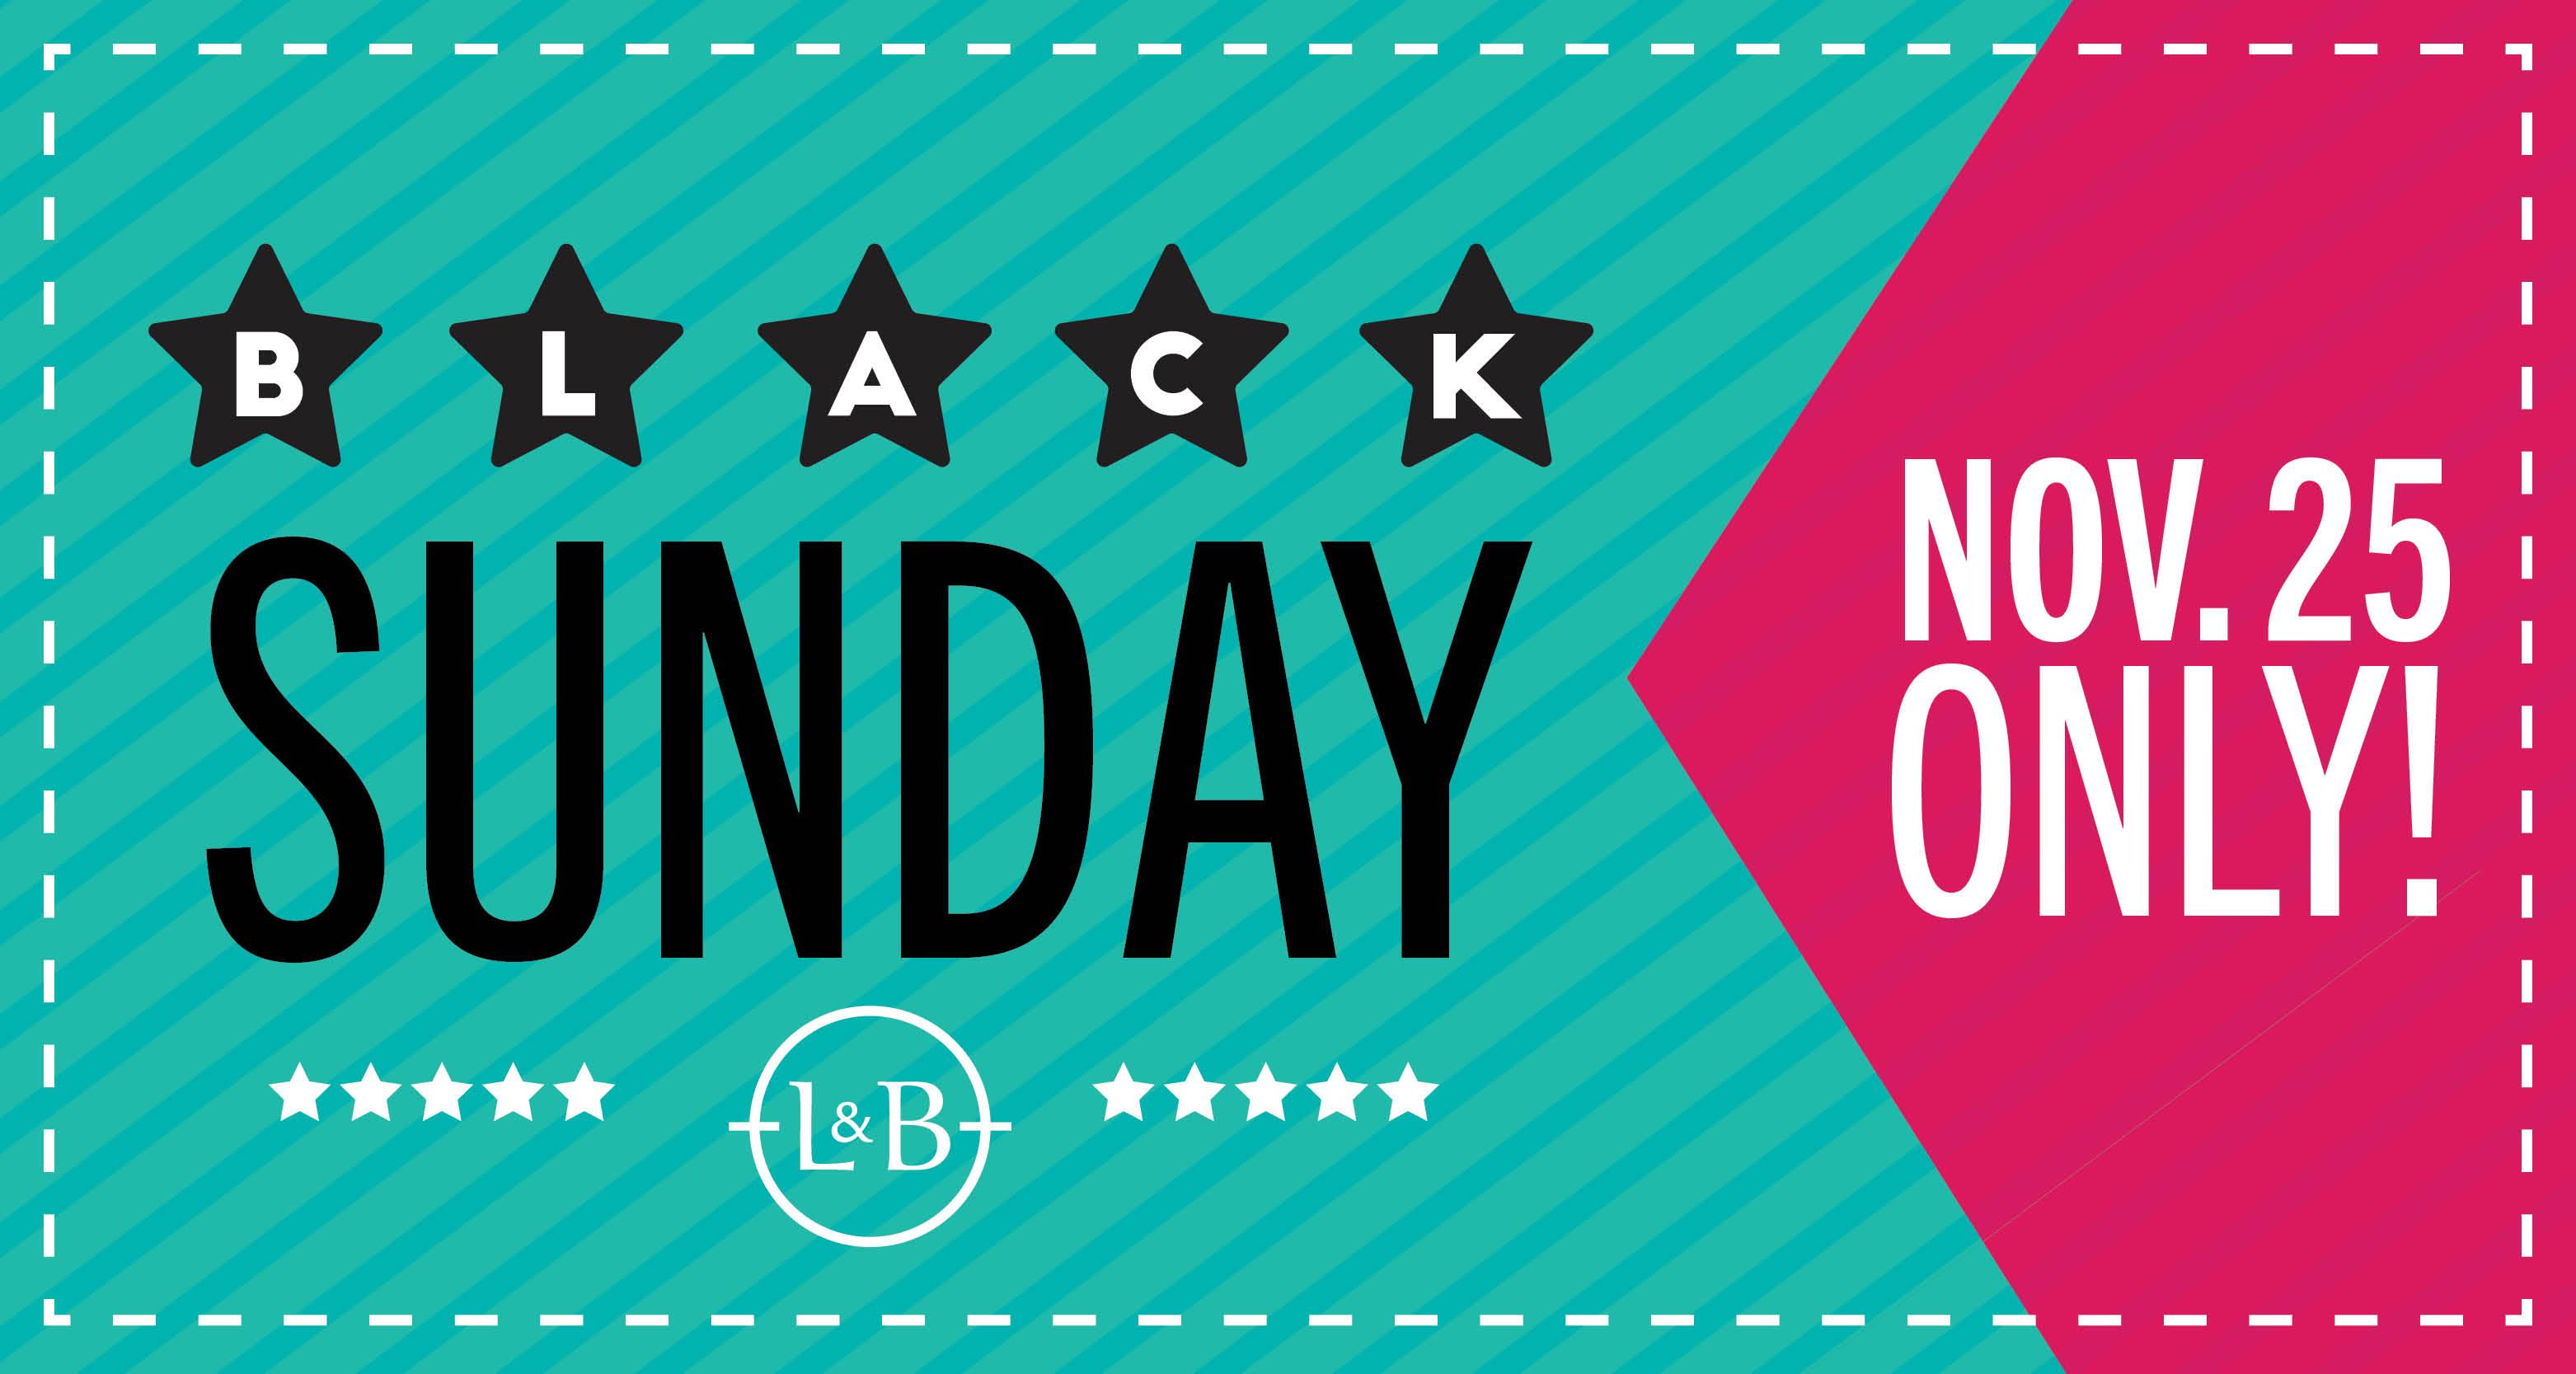 Black Sunday savings in Wines & Spirits! Sunday, November 25 only!